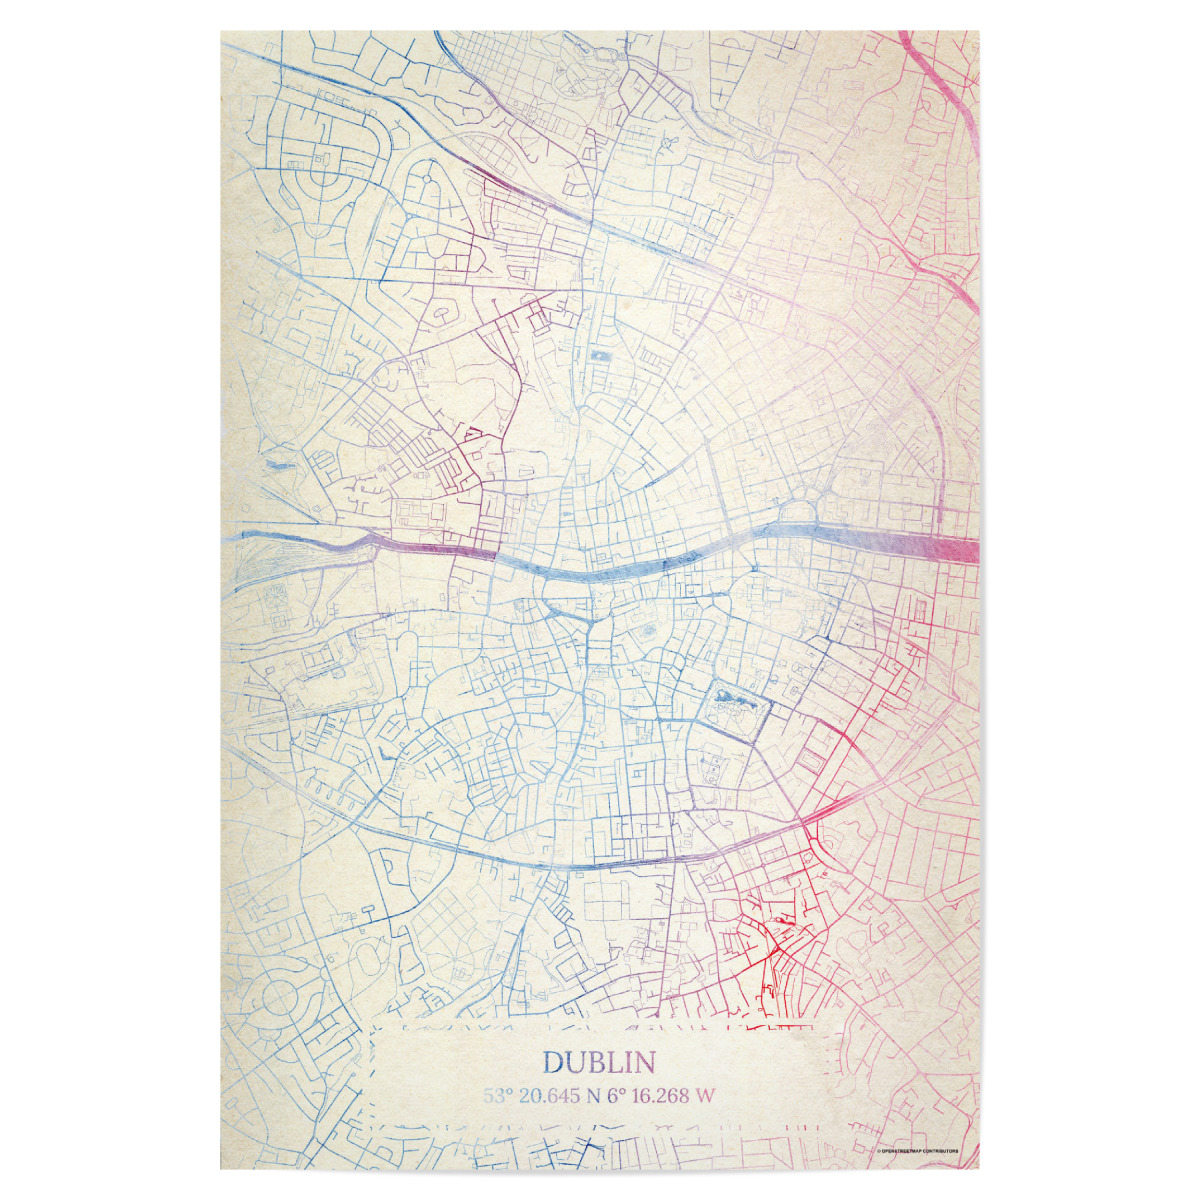 Dublin Hotels Map on